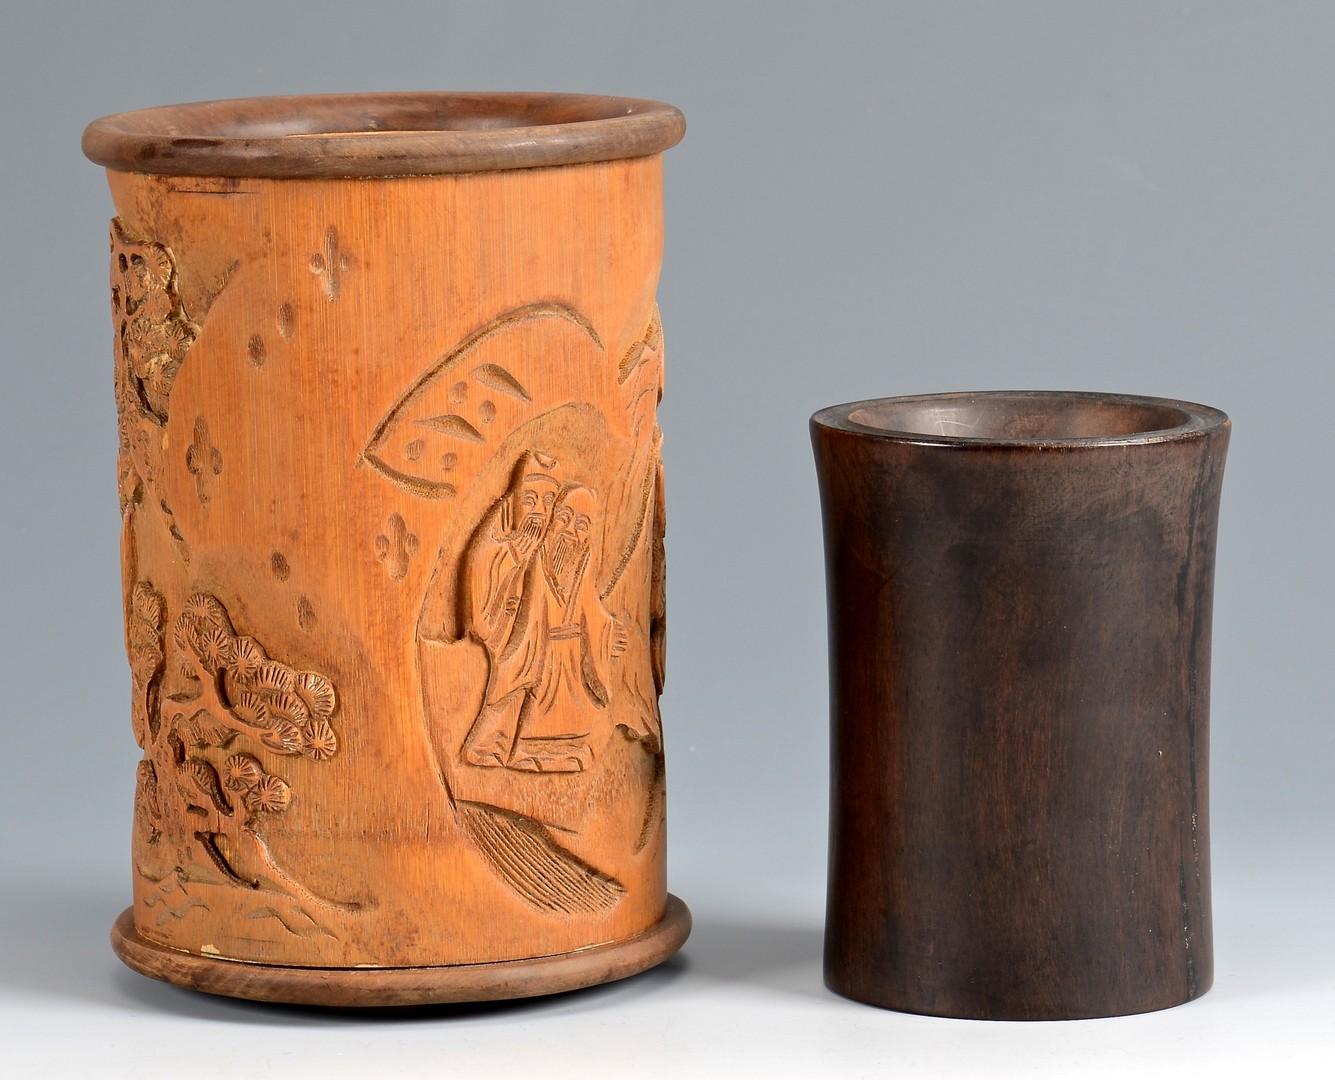 Lot 3832398: 2 Hardwood Brush Pots, poss. Huanghuali and Zitan